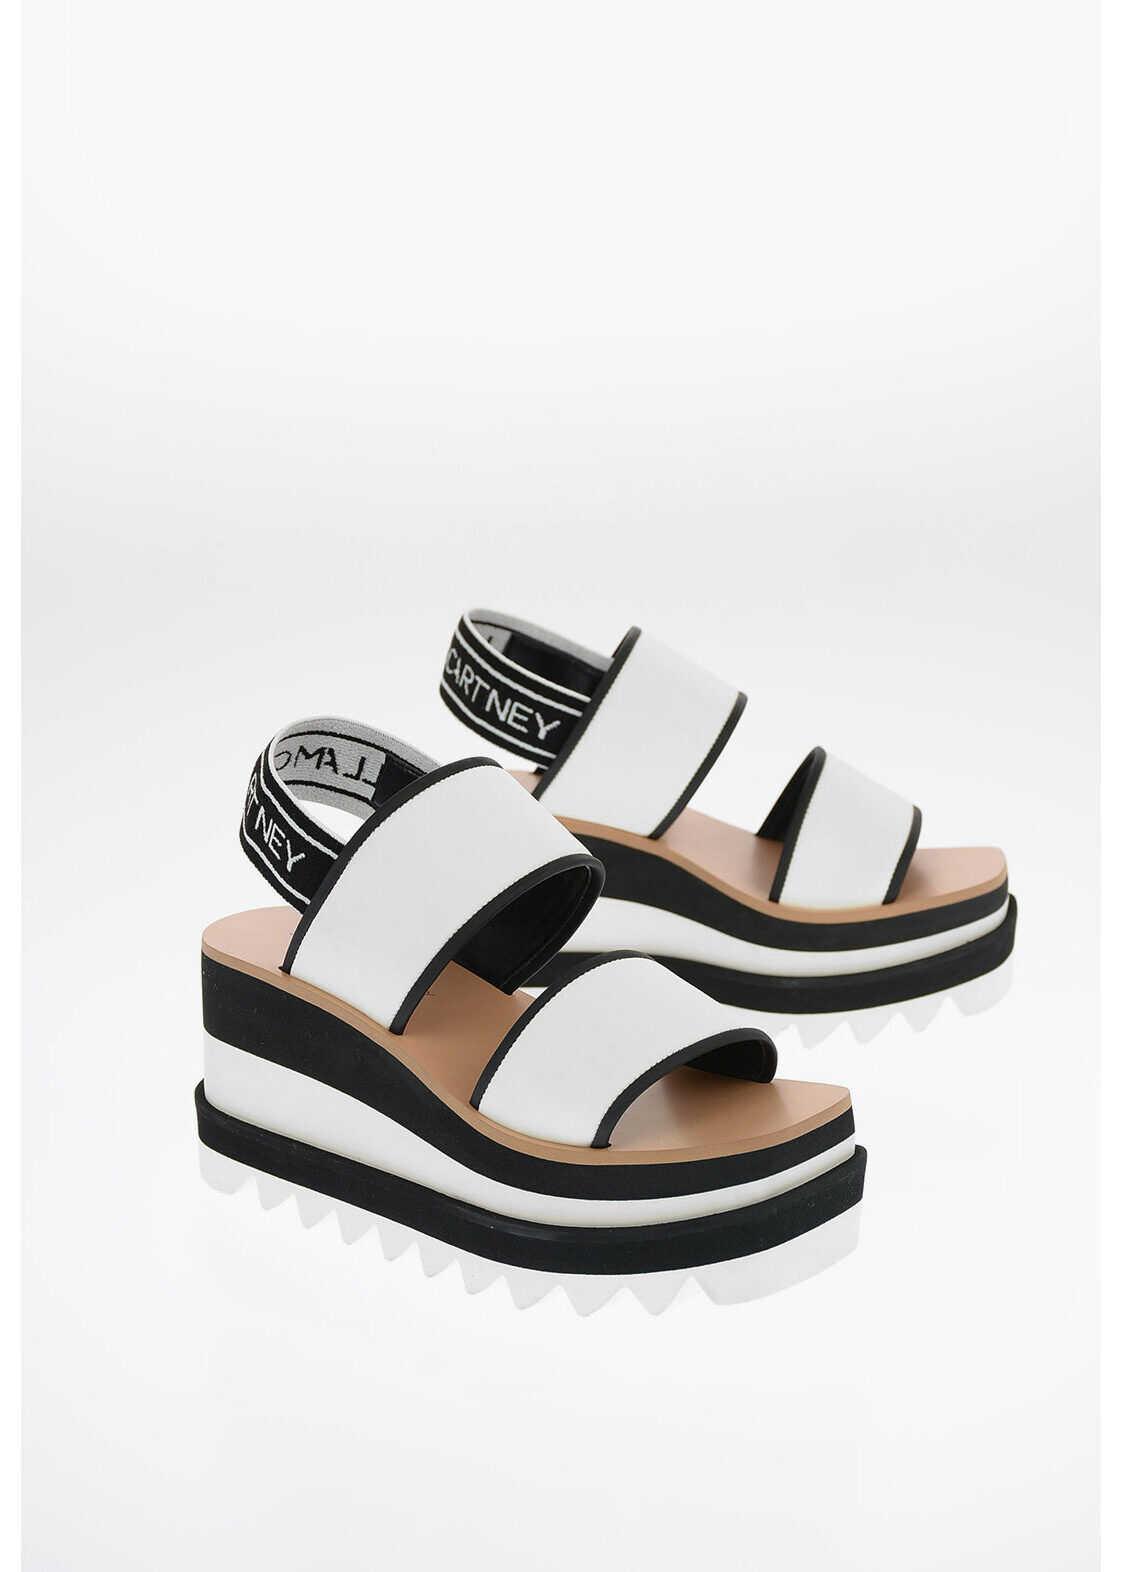 Stella McCartney Platform Sandals with Stretchy Strap 8cm BLACK & WHITE imagine b-mall.ro